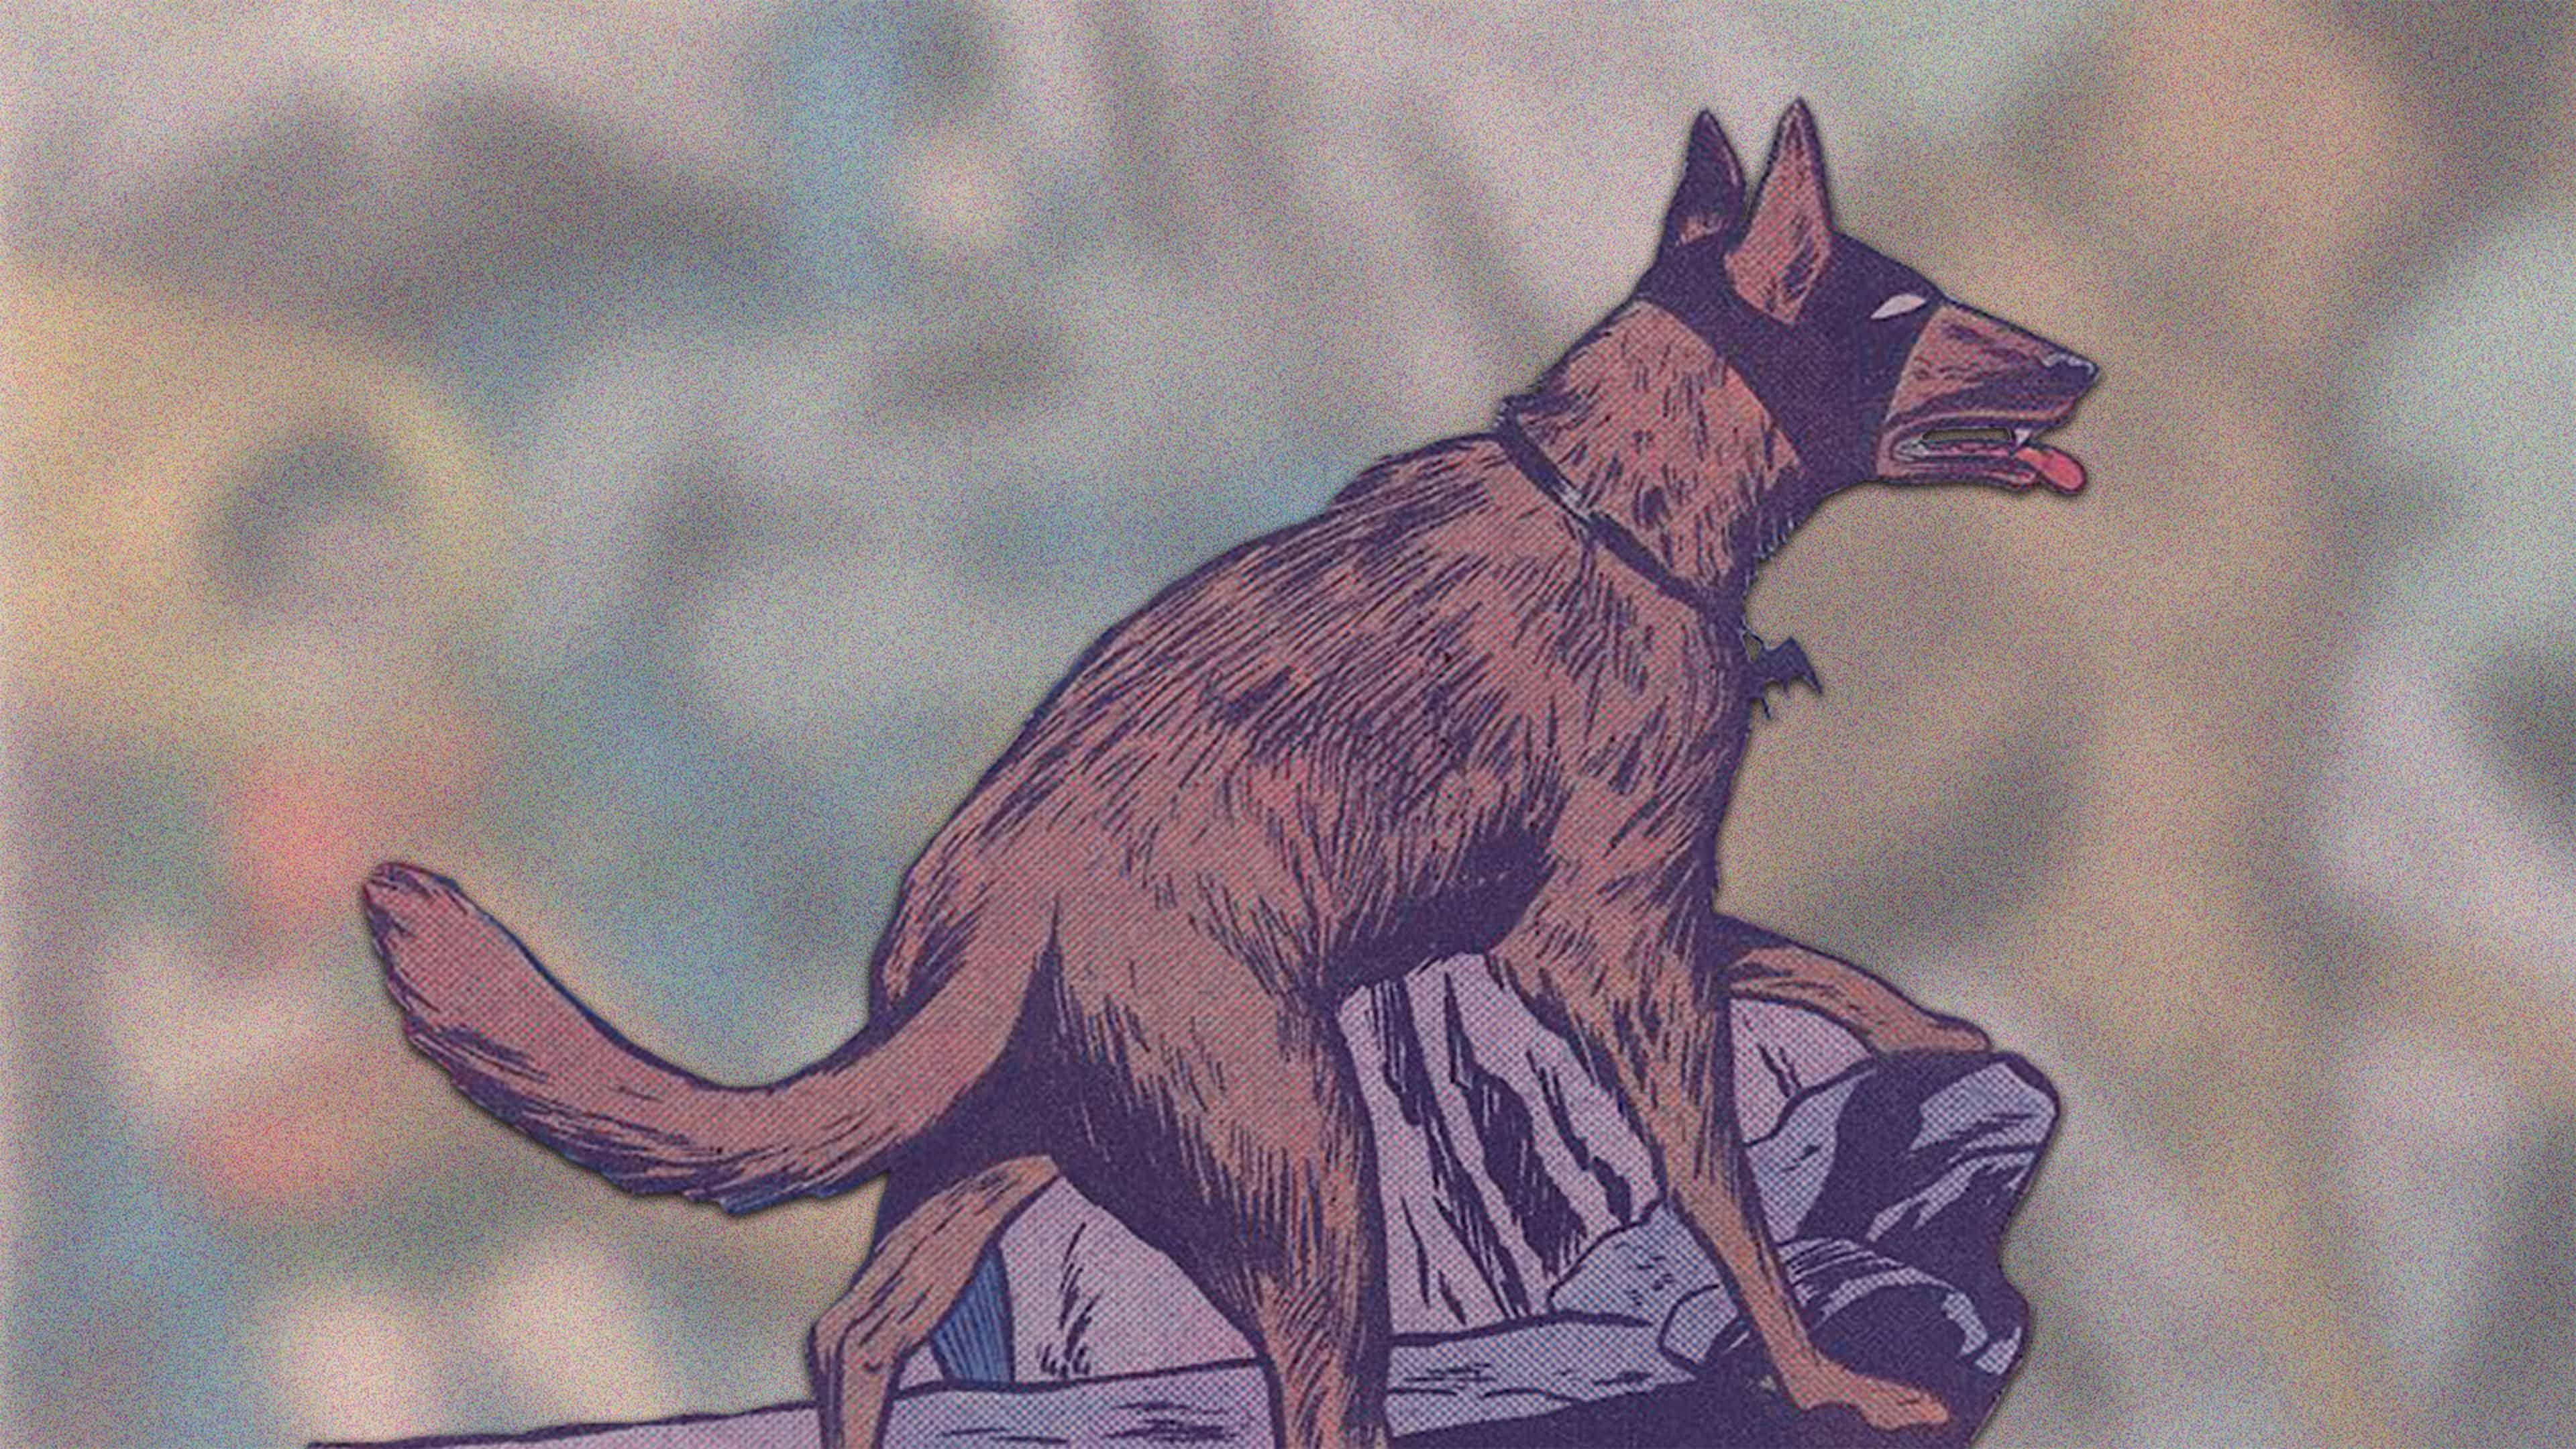 awesomedcdoggos_news_hero-c_v1_191206.jpg